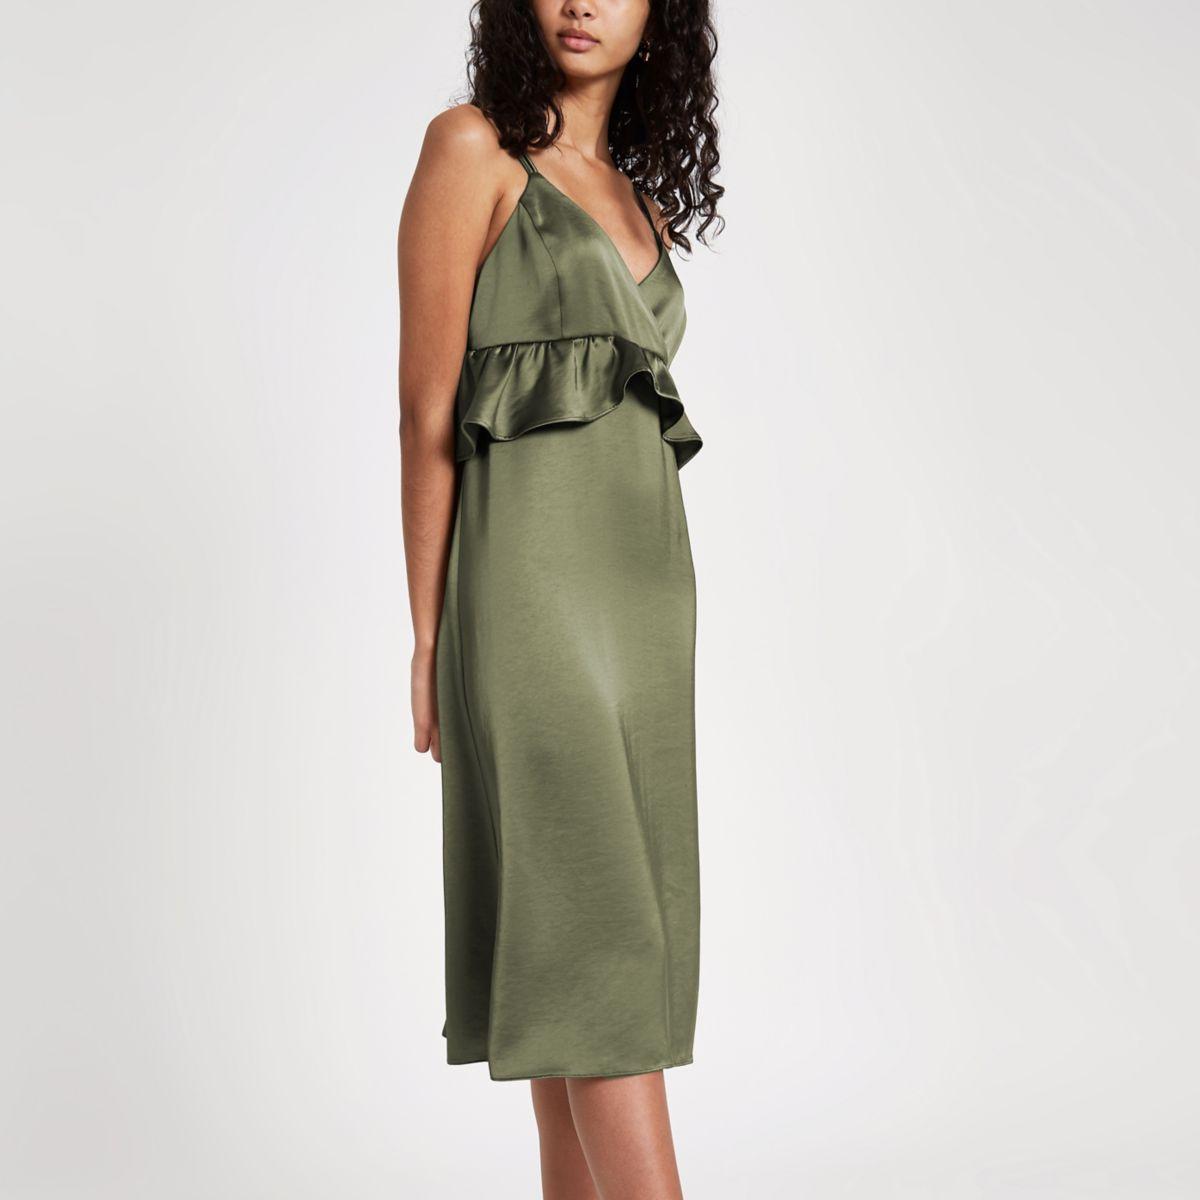 Womens Khaki satin frill cami slip dress River Island Hot Sale Online Cheap Recommend Exclusive Online qN9iGi